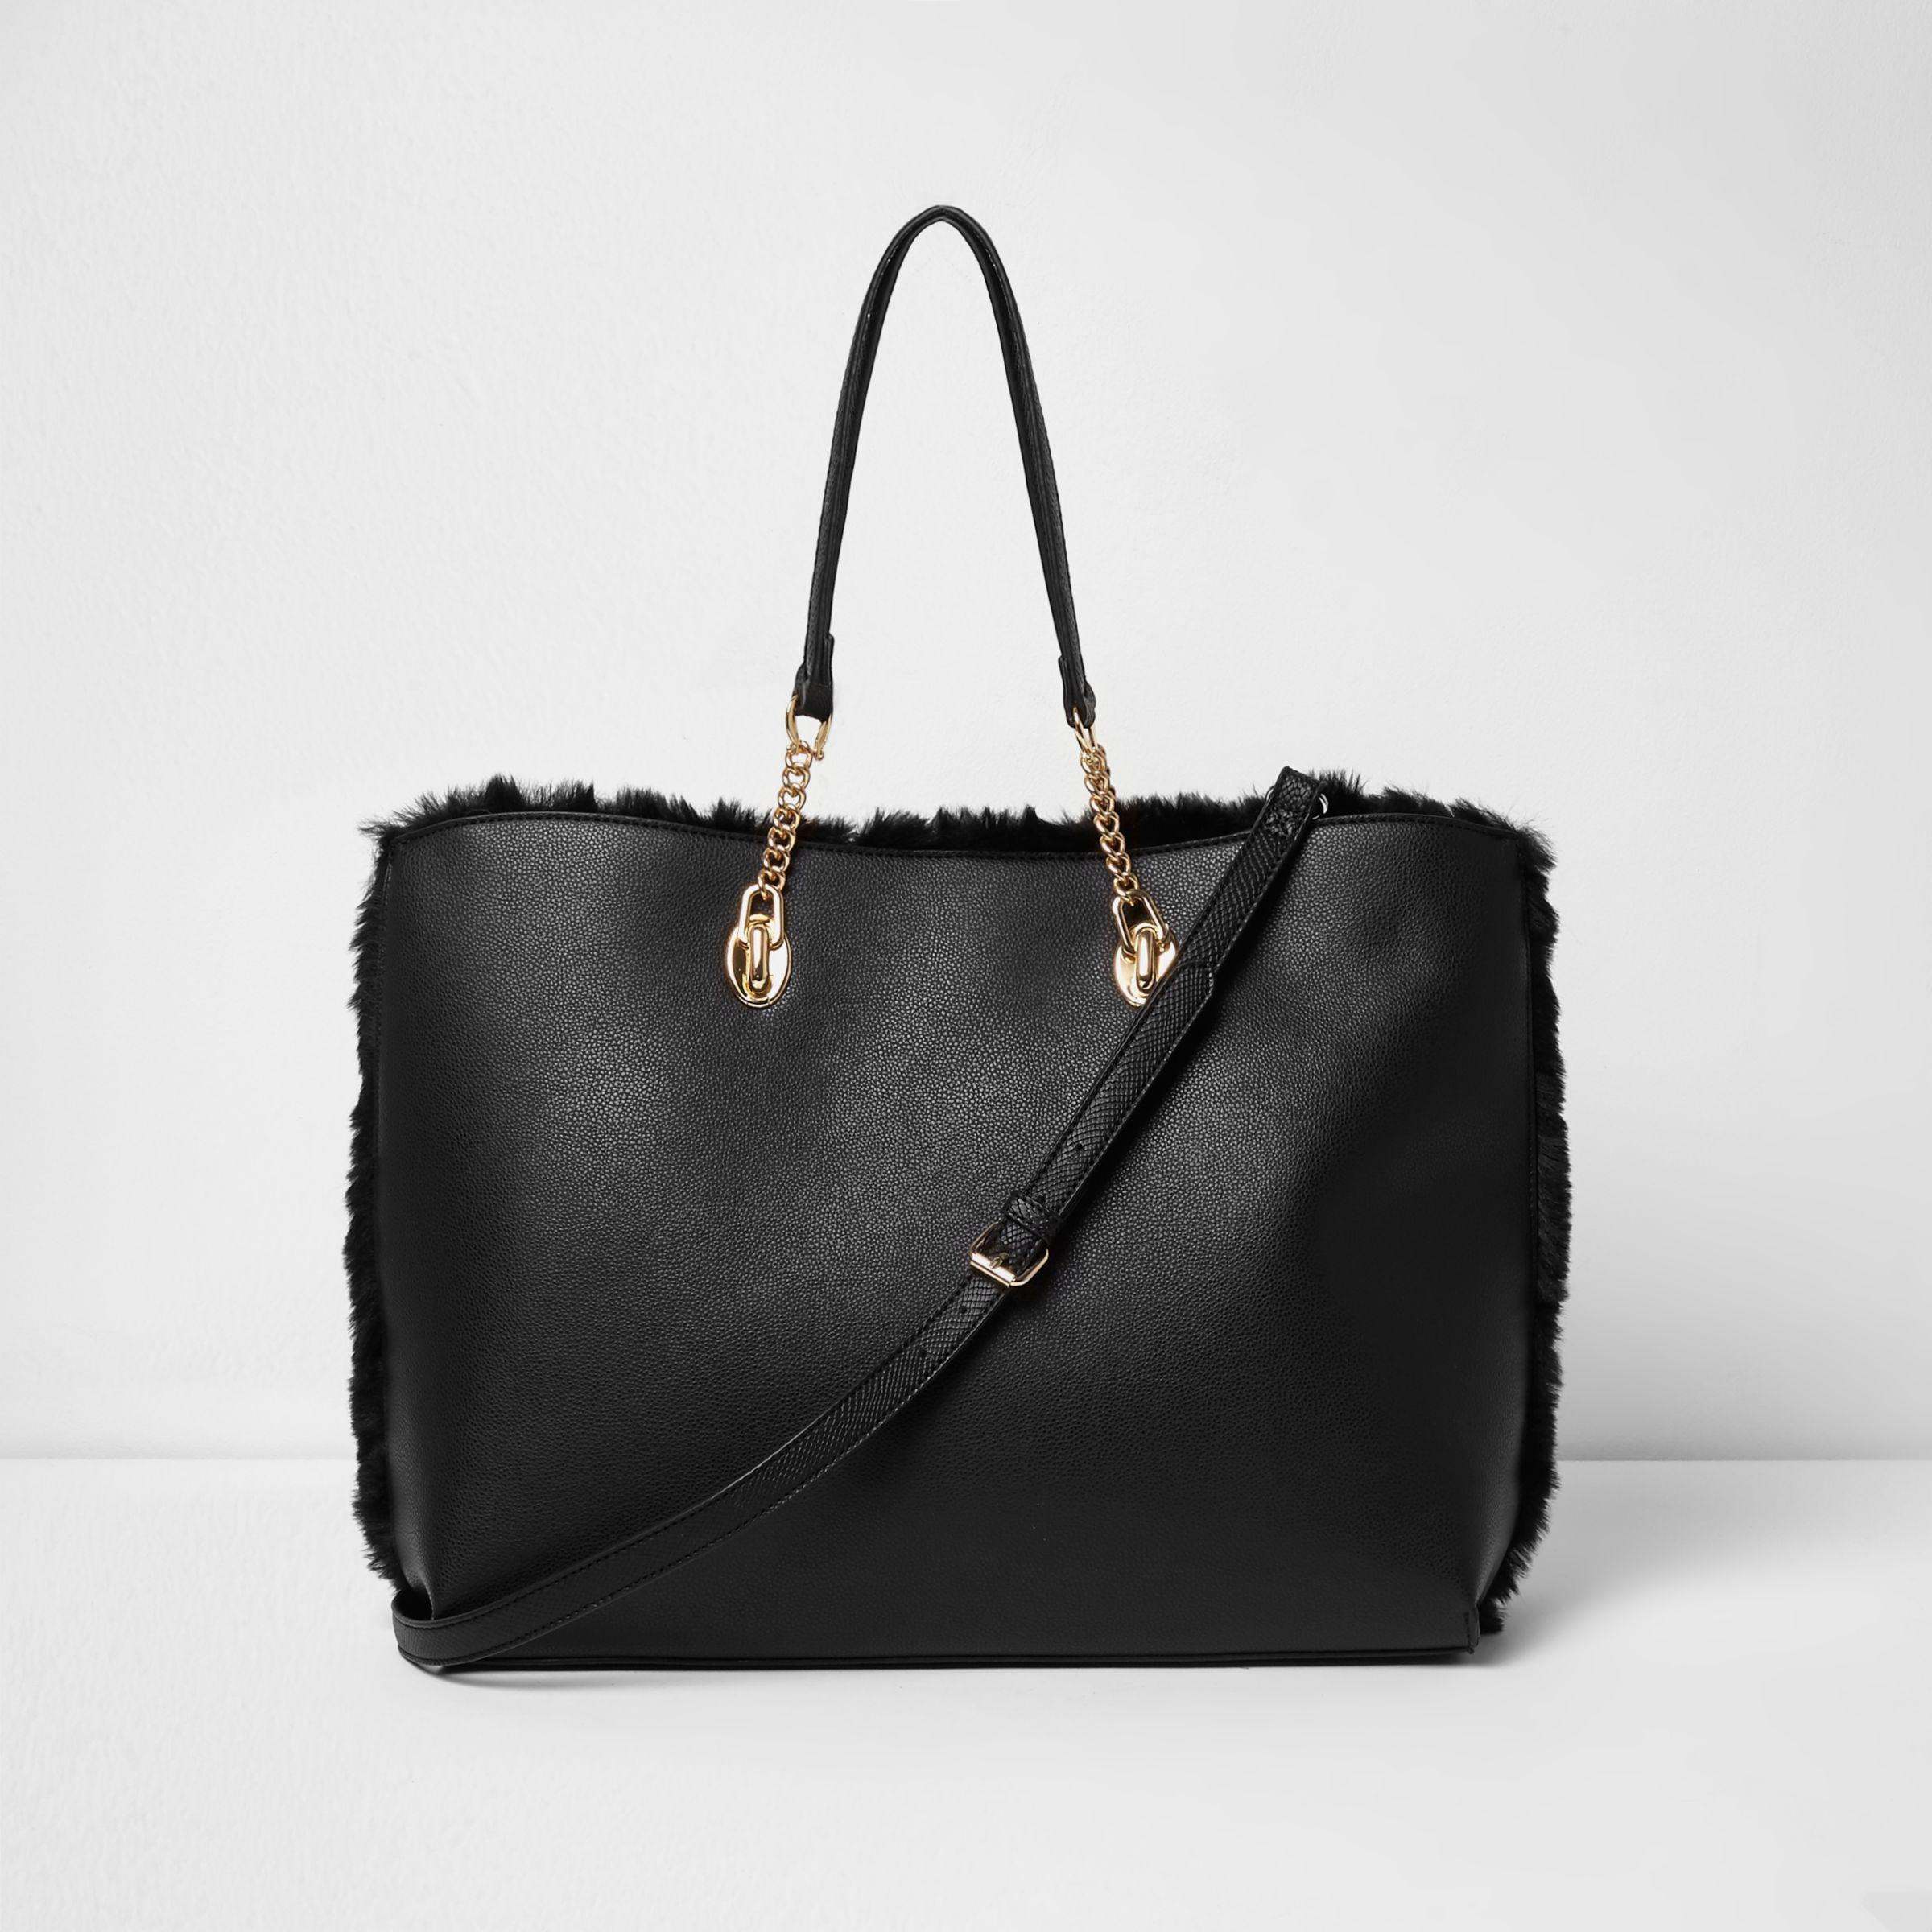 1d61e2a1b2 Lyst - River Island Black Faux Fur Front Tassel Large Tote Bag in Black